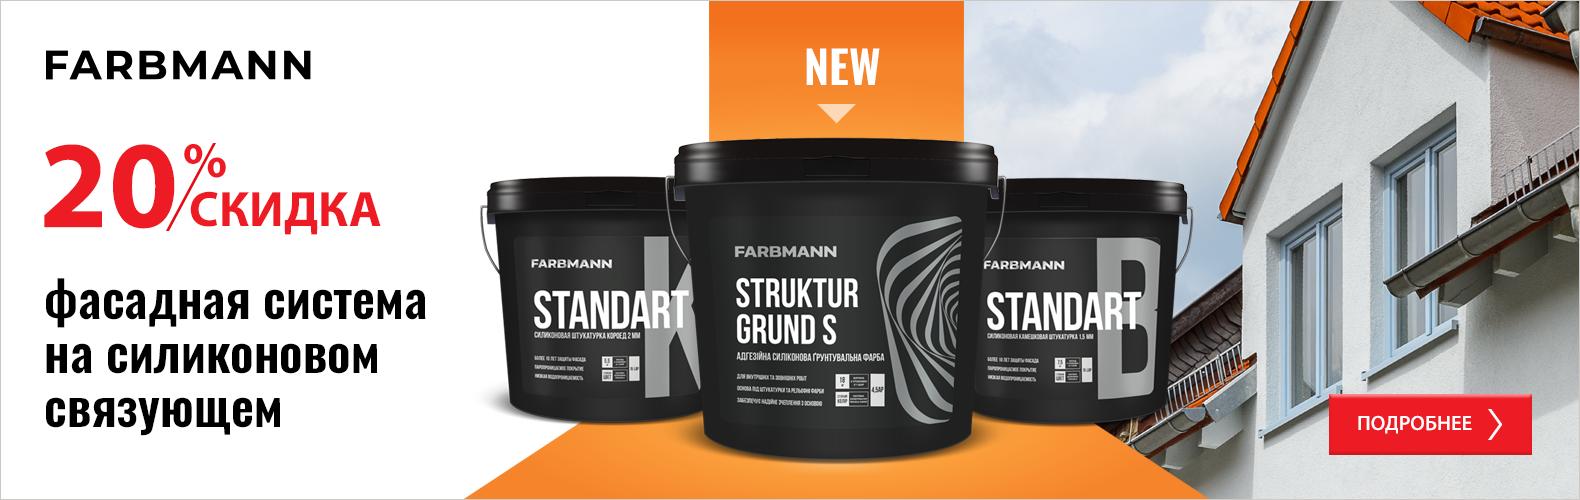 Farbmann Struktur Grund S\Standart K\Standart B